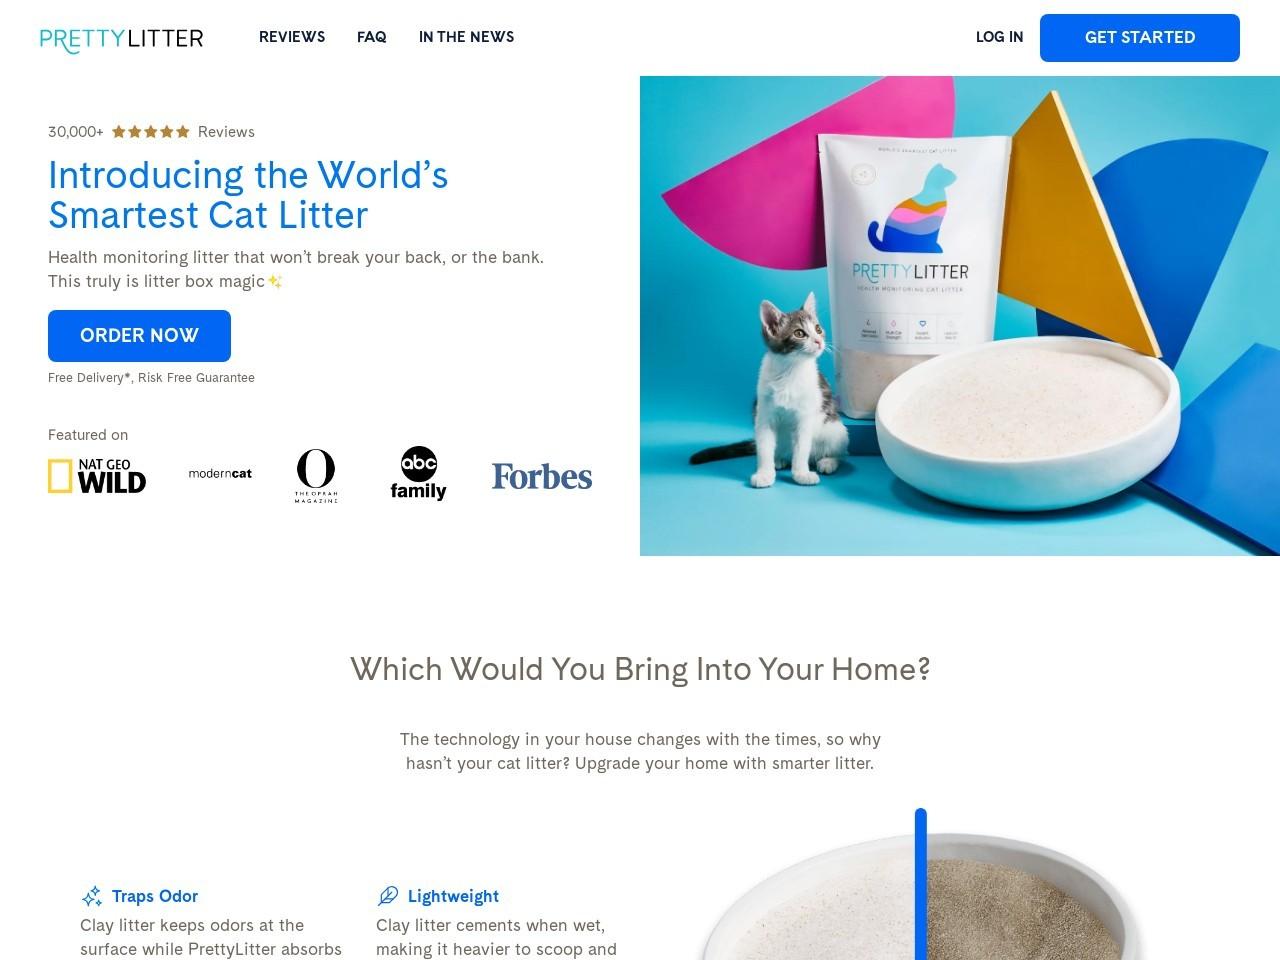 prettylittercats.com